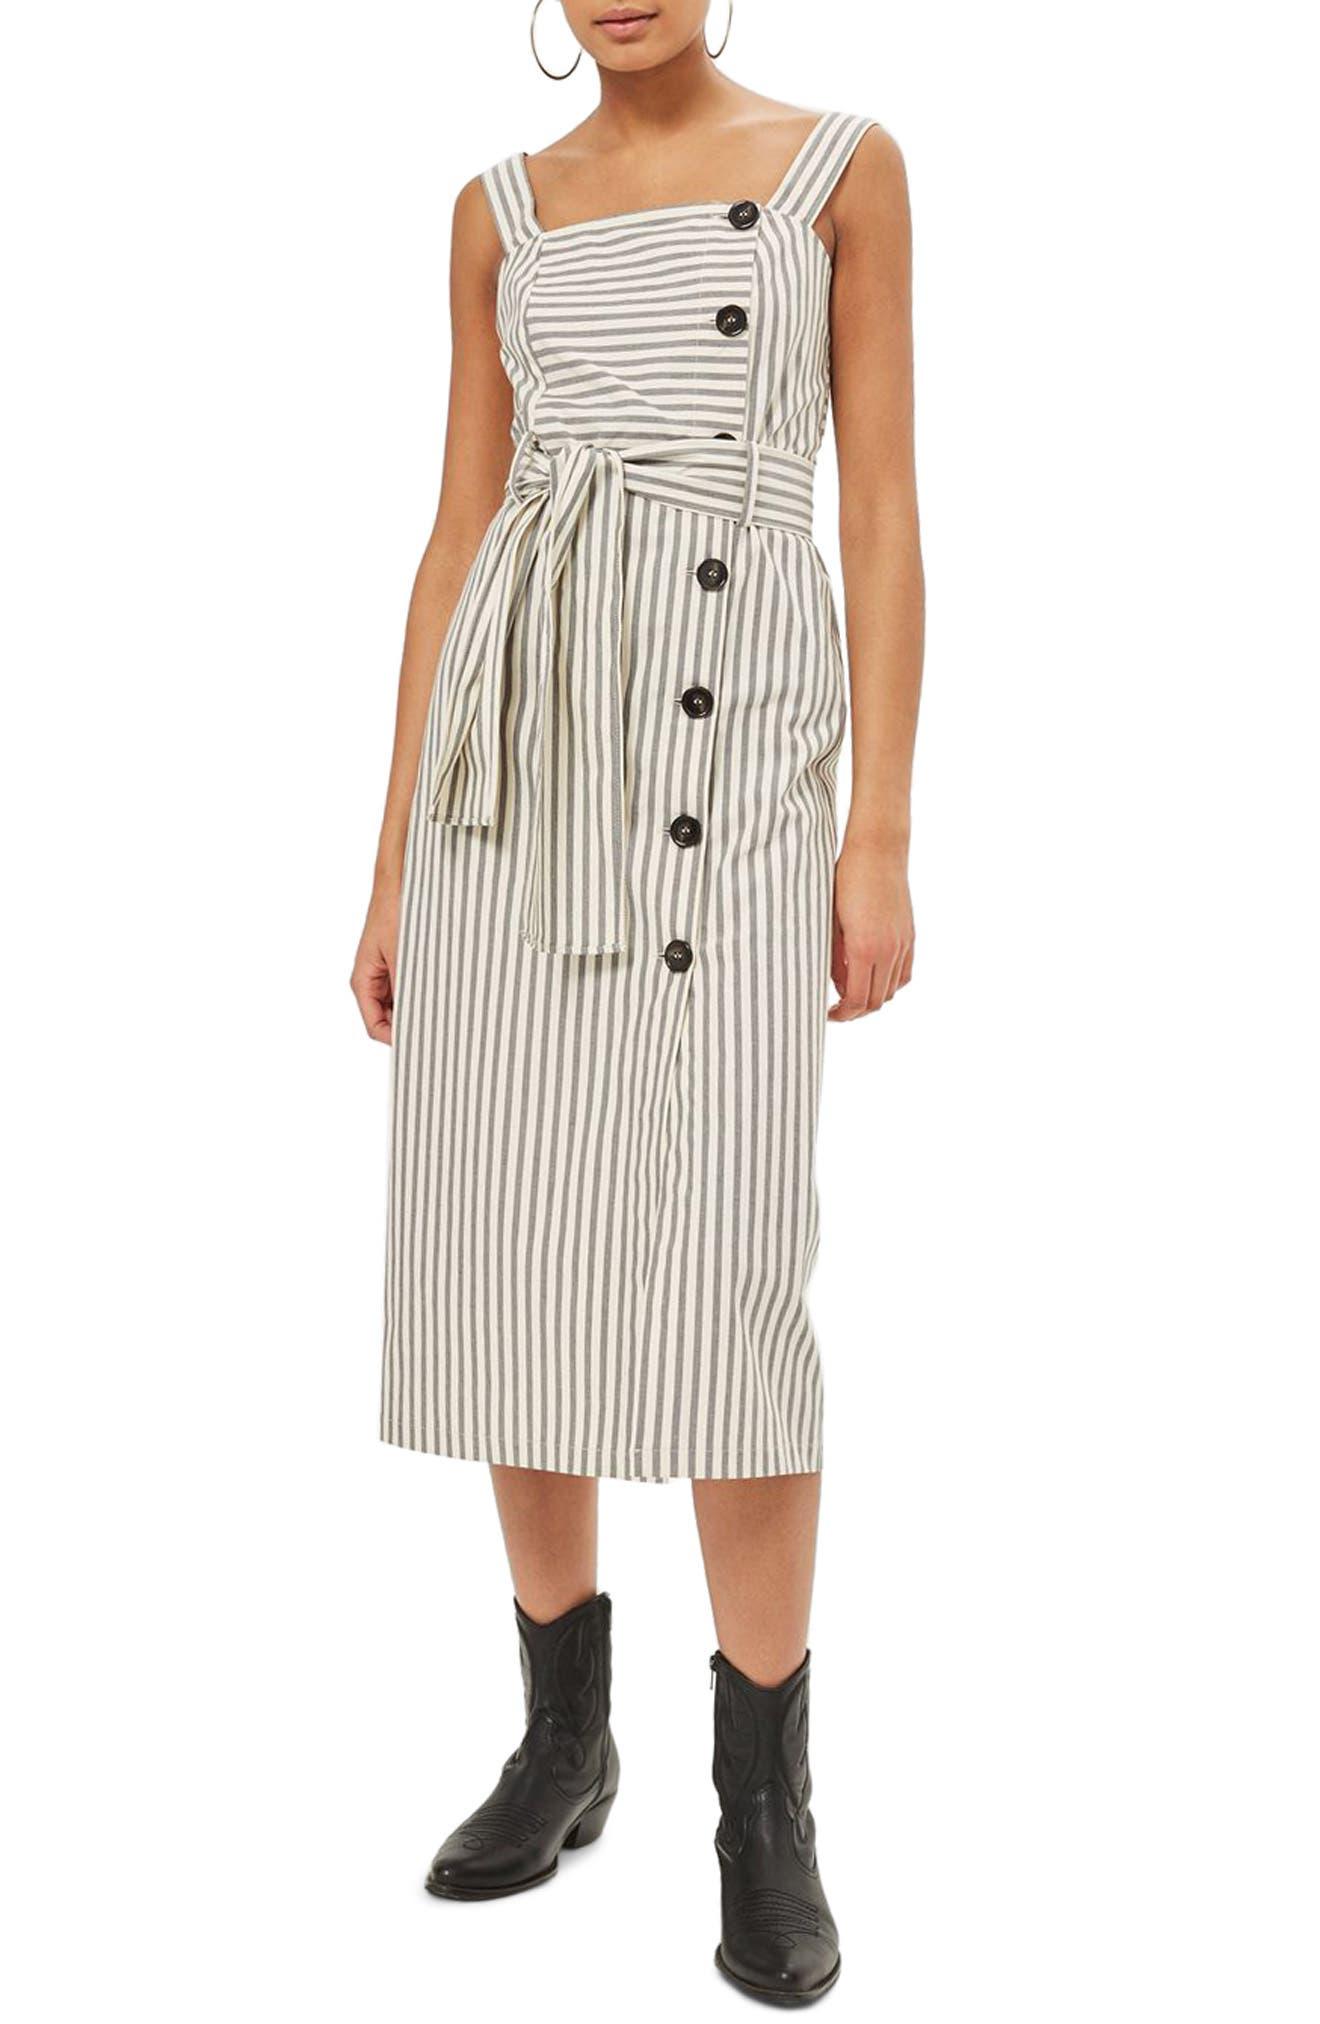 Topshop Stripe Midi Dress